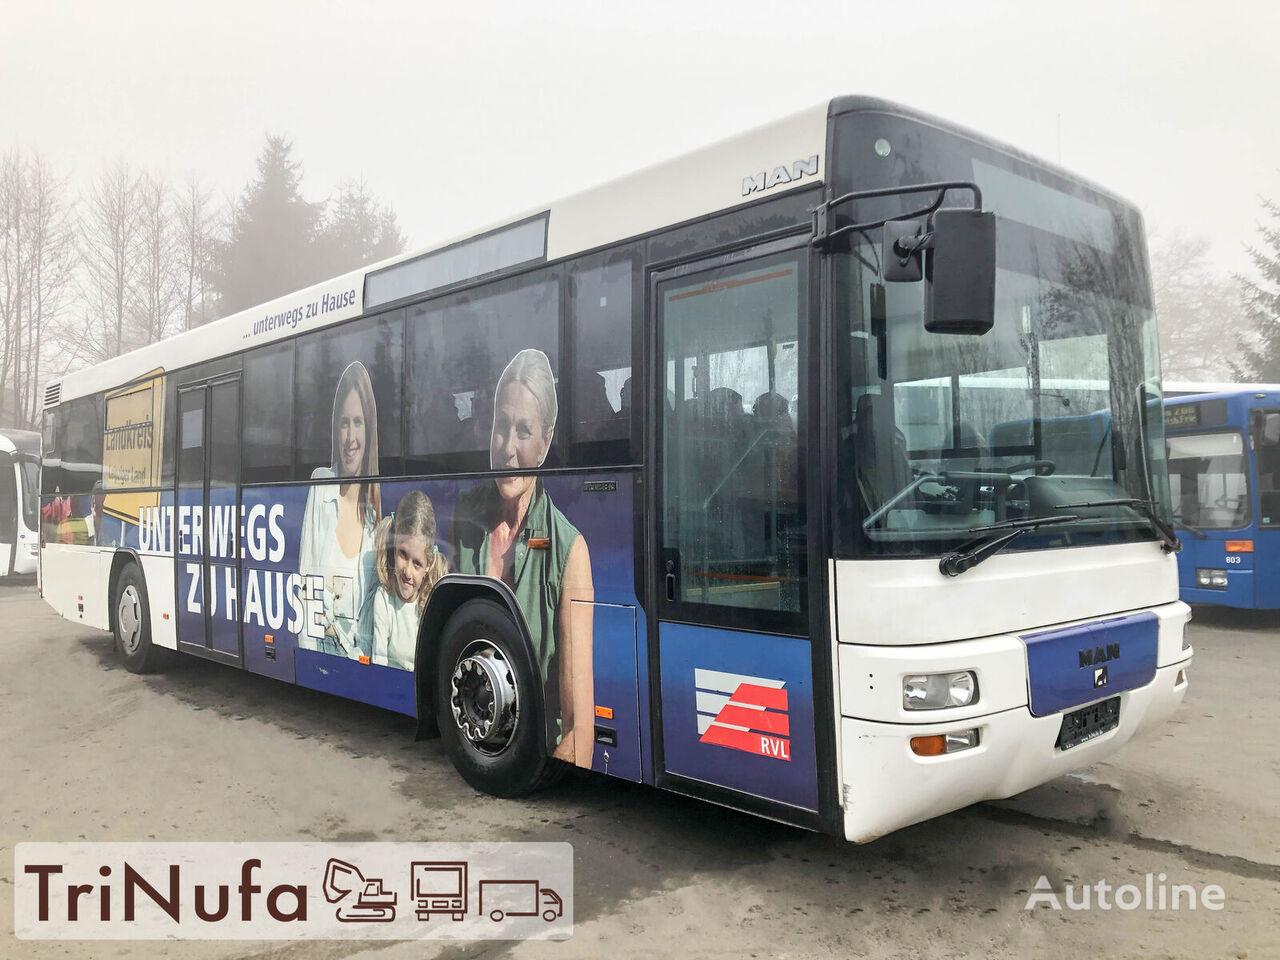 MAN A 72 | Euro 3 | TÜV 11 / 2021 |  interurban bus